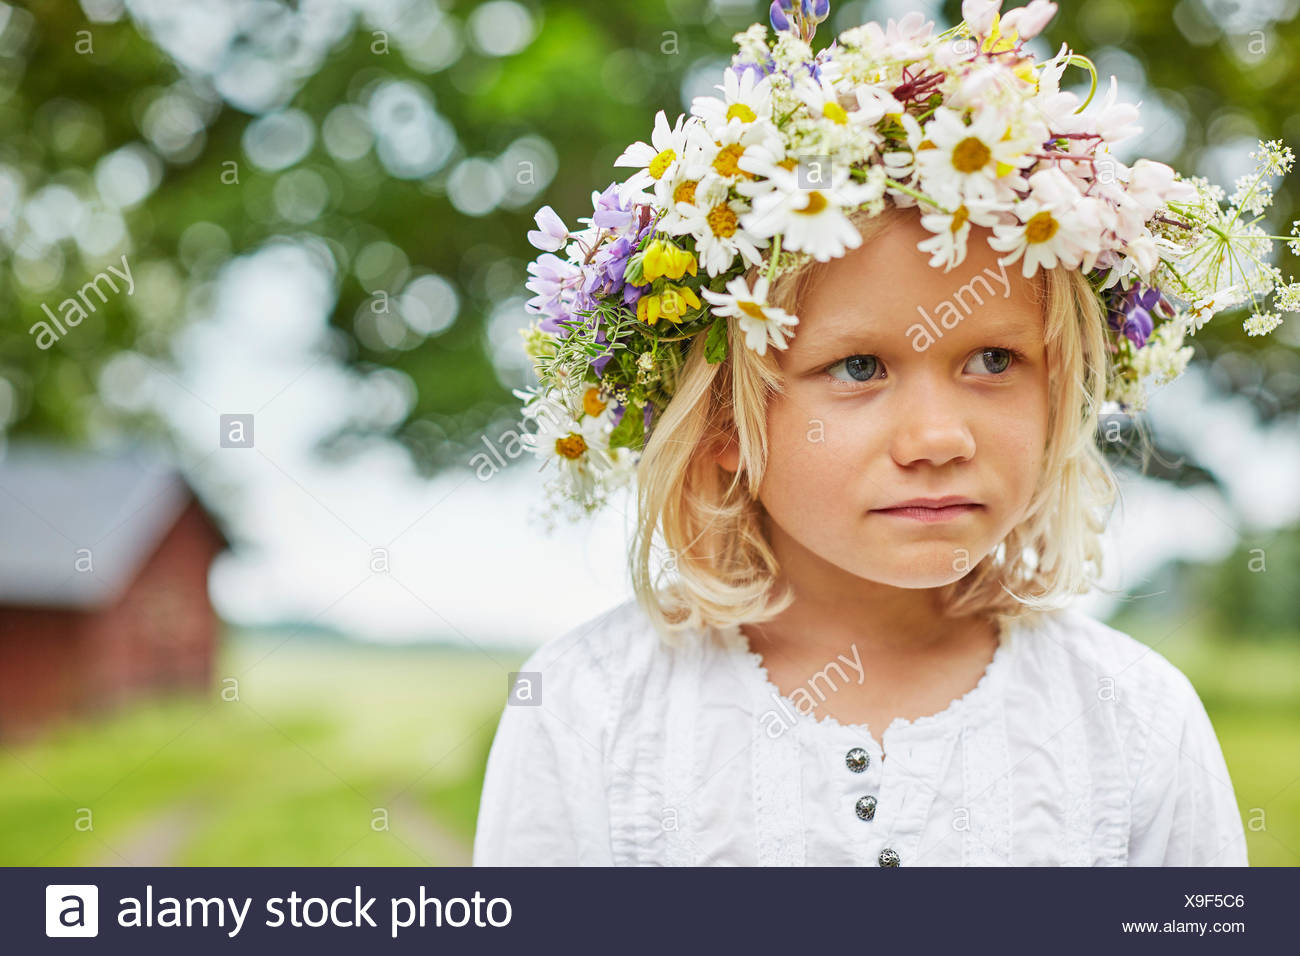 Flower crown girl stock photos flower crown girl stock images alamy girl wearing a flower crown stock image izmirmasajfo